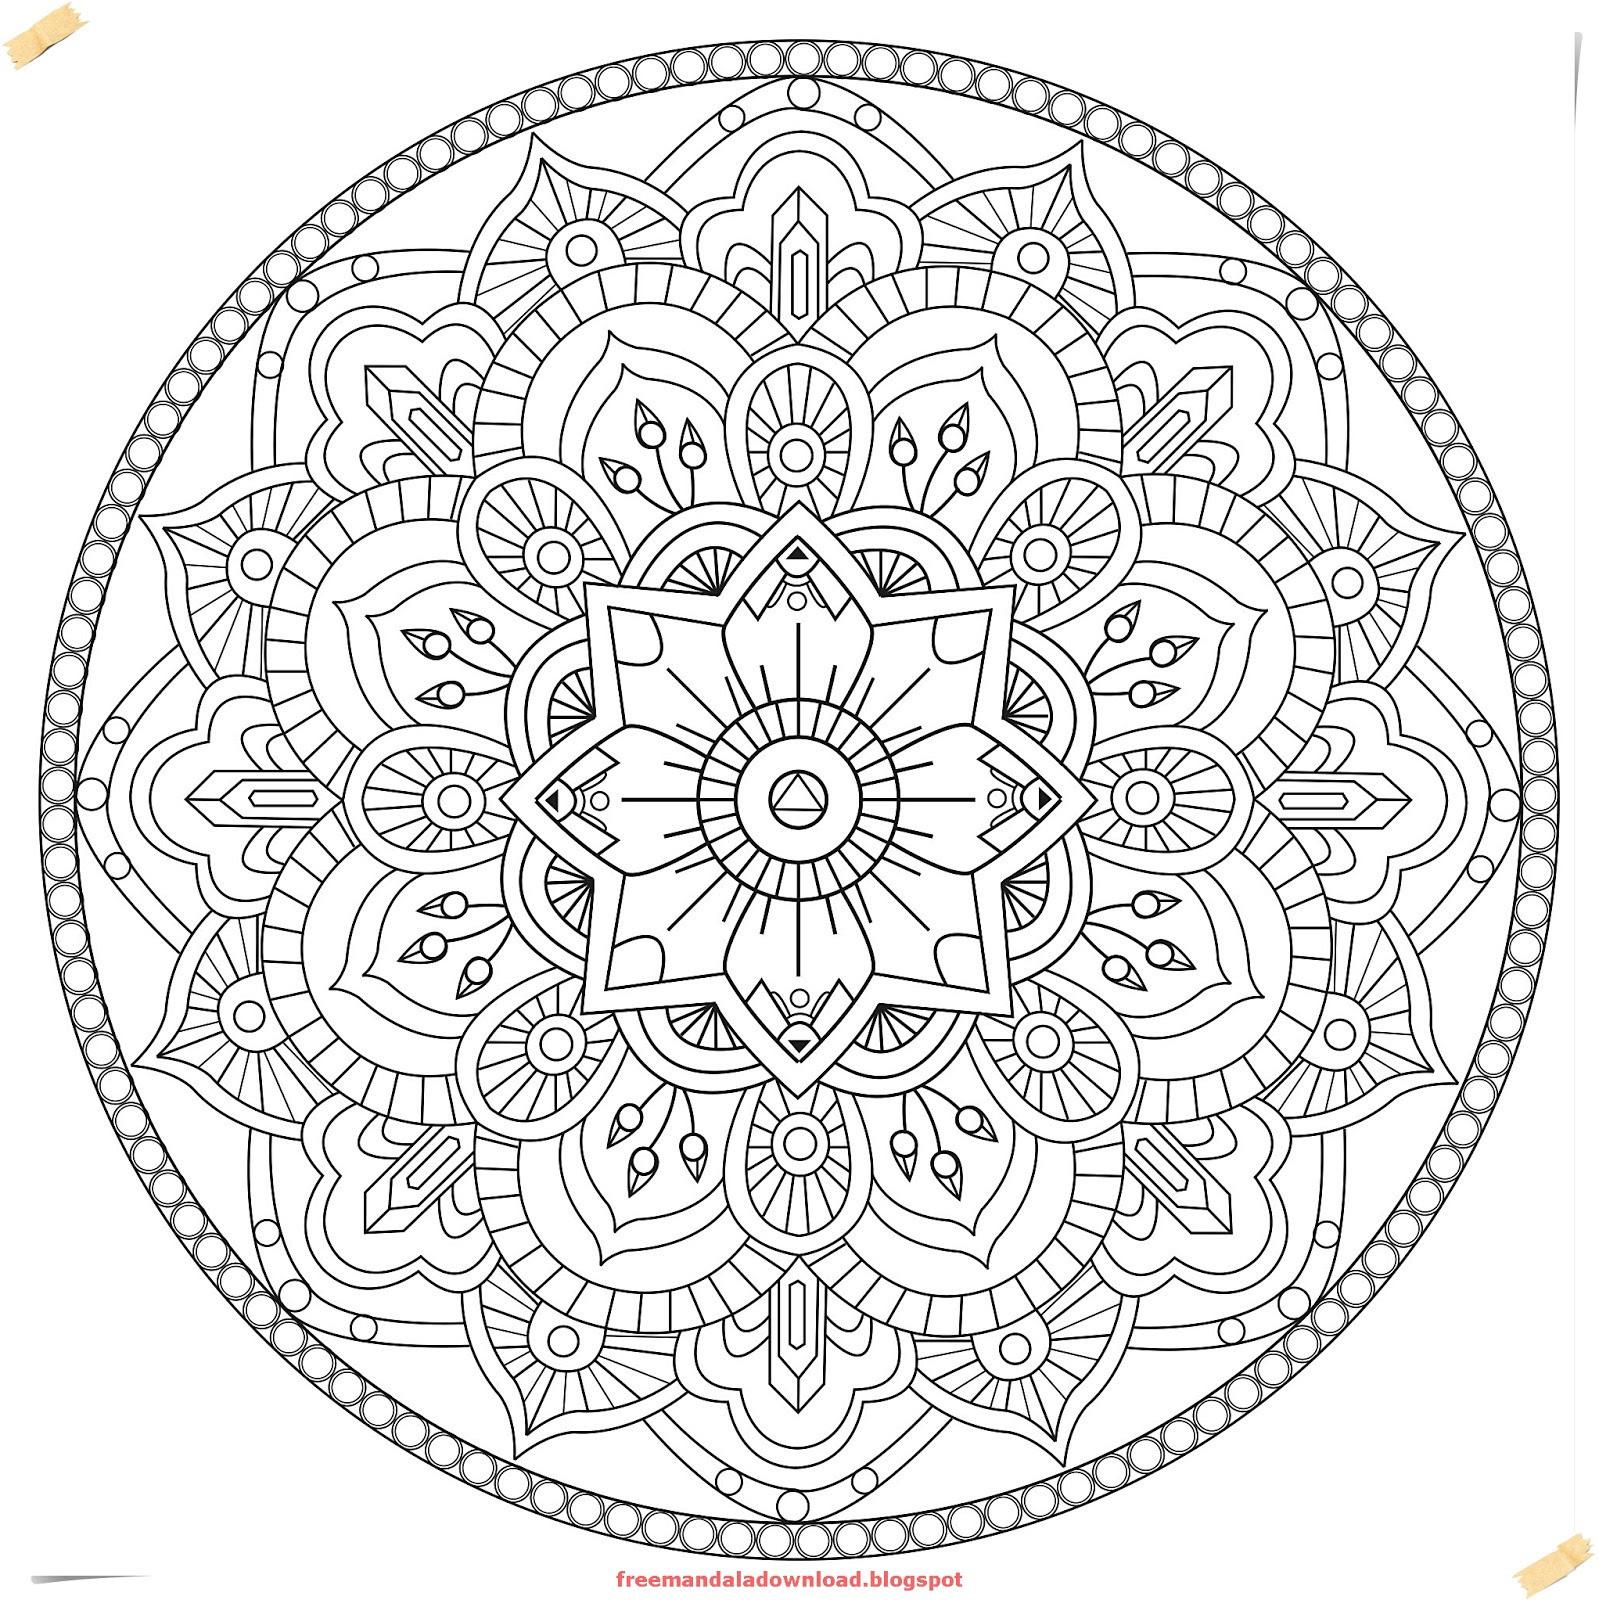 Mandala Zum Ausdrucken Erwachsene Neu Frais Schwere Mandalas Für Erwachsene Zum Ausdrucken – Duschbehalter Fotos